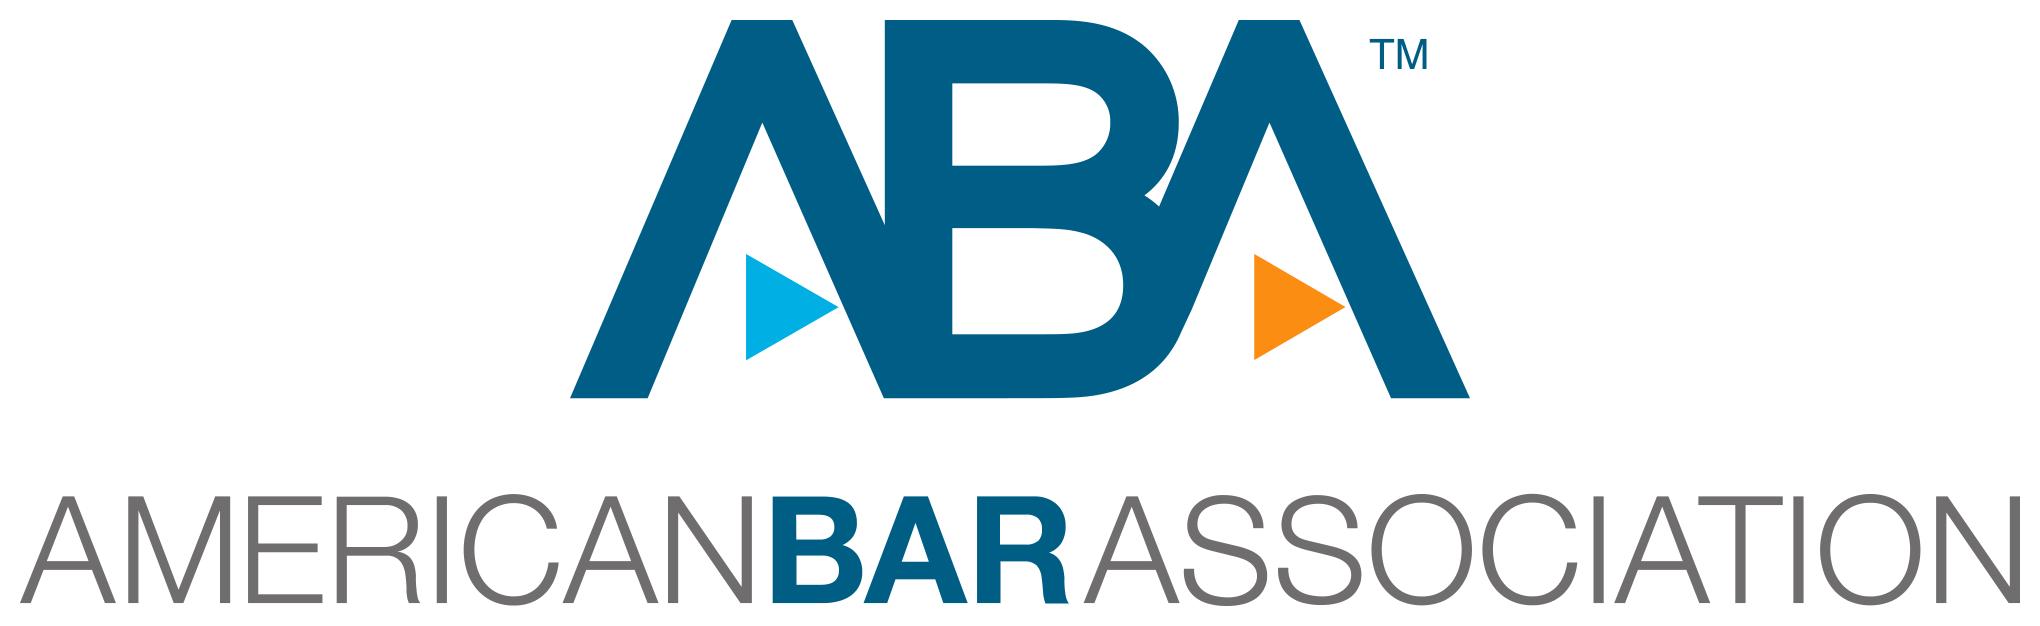 New Logo for American Bar Association by Finn Partners